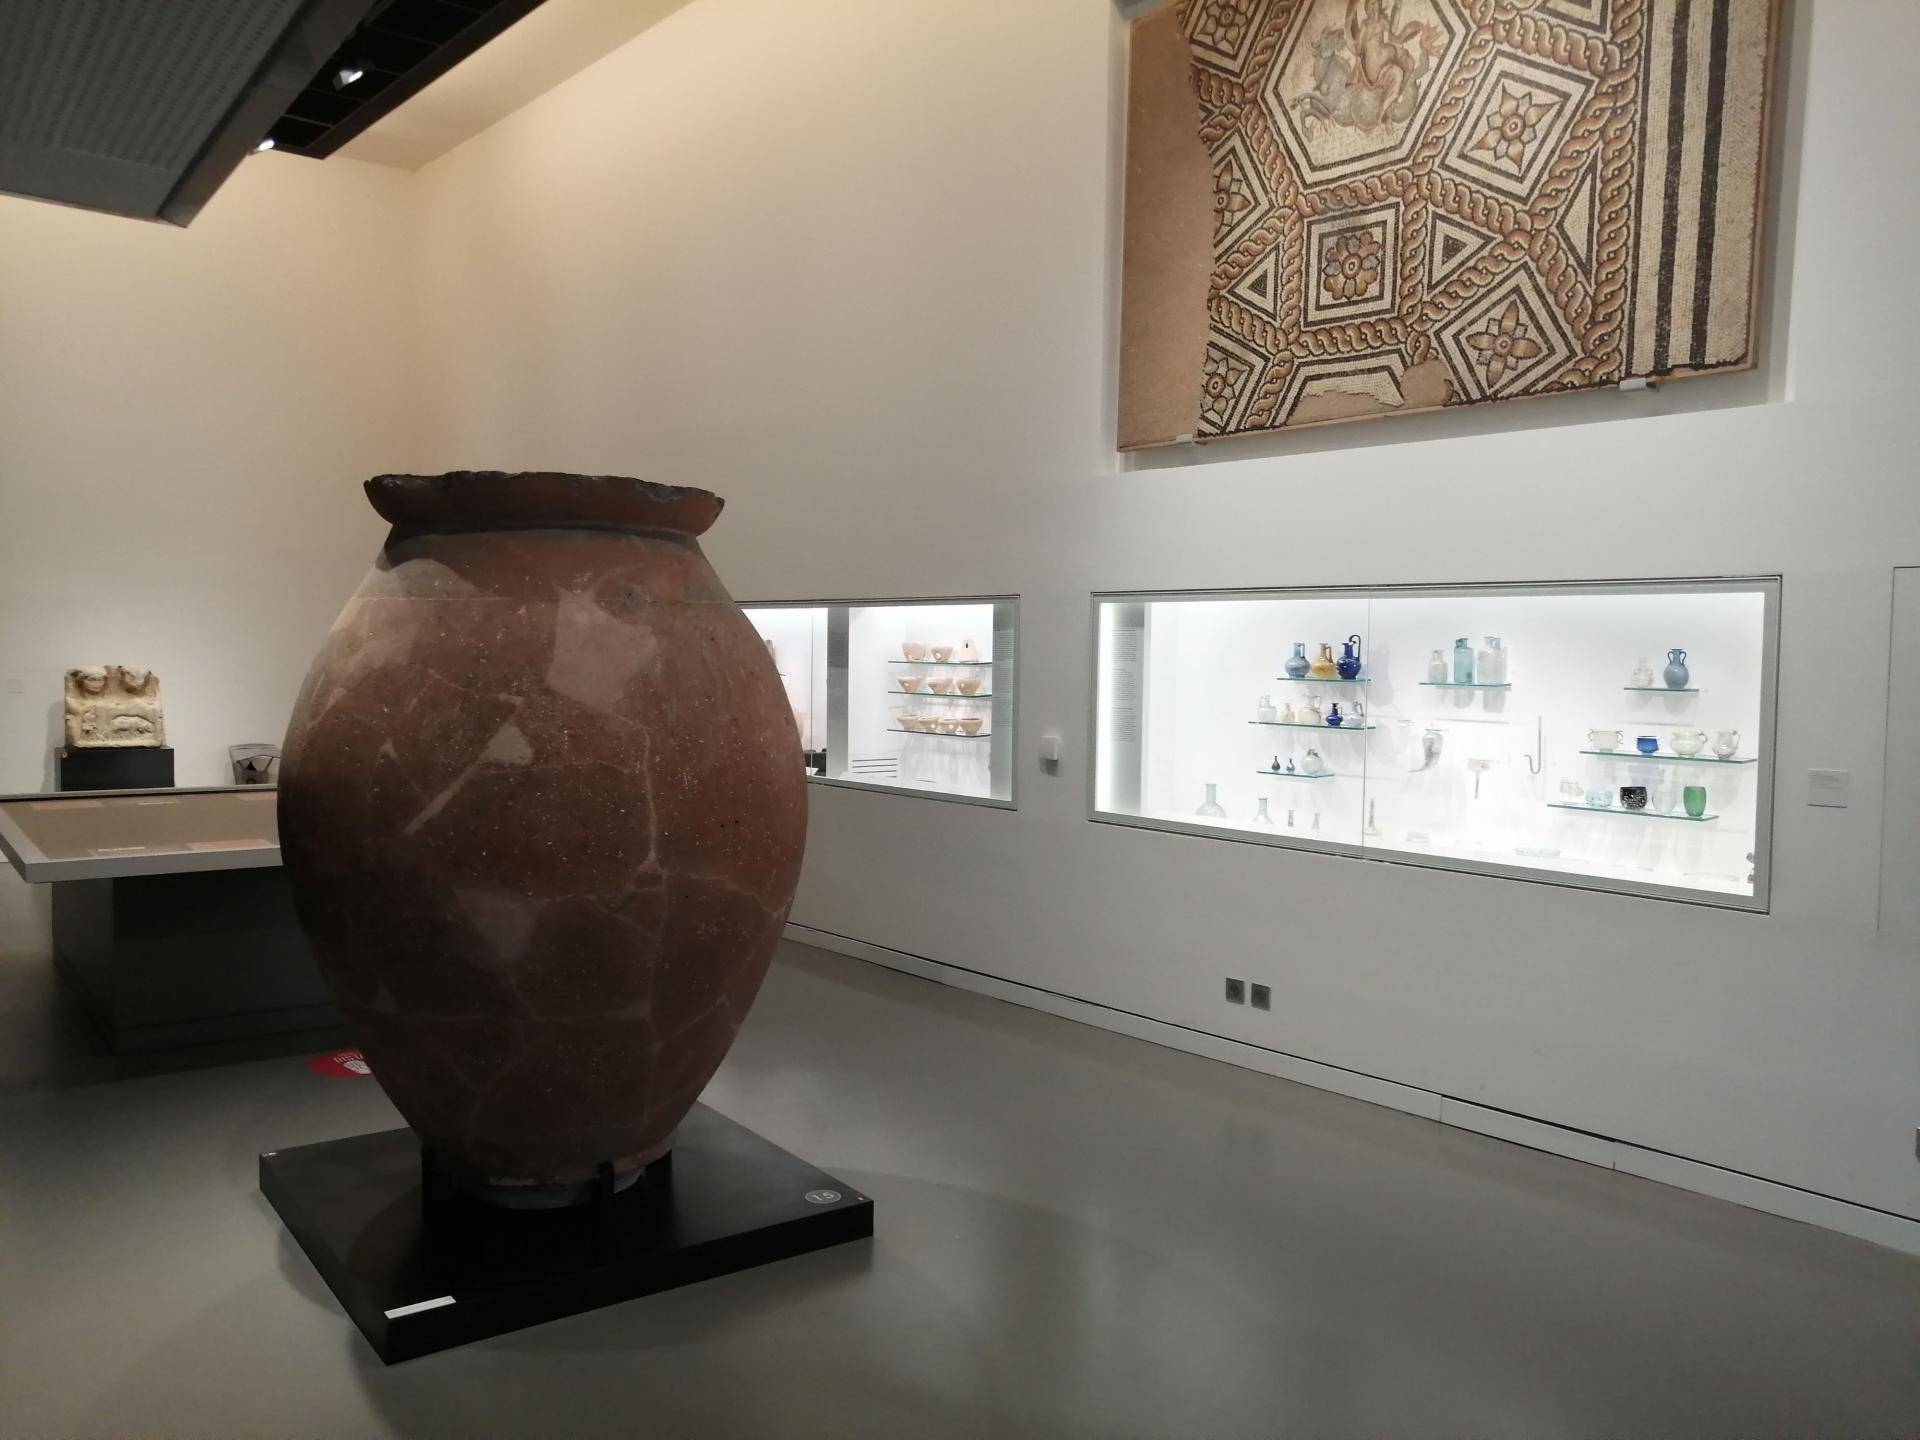 Musee de la romanite 3